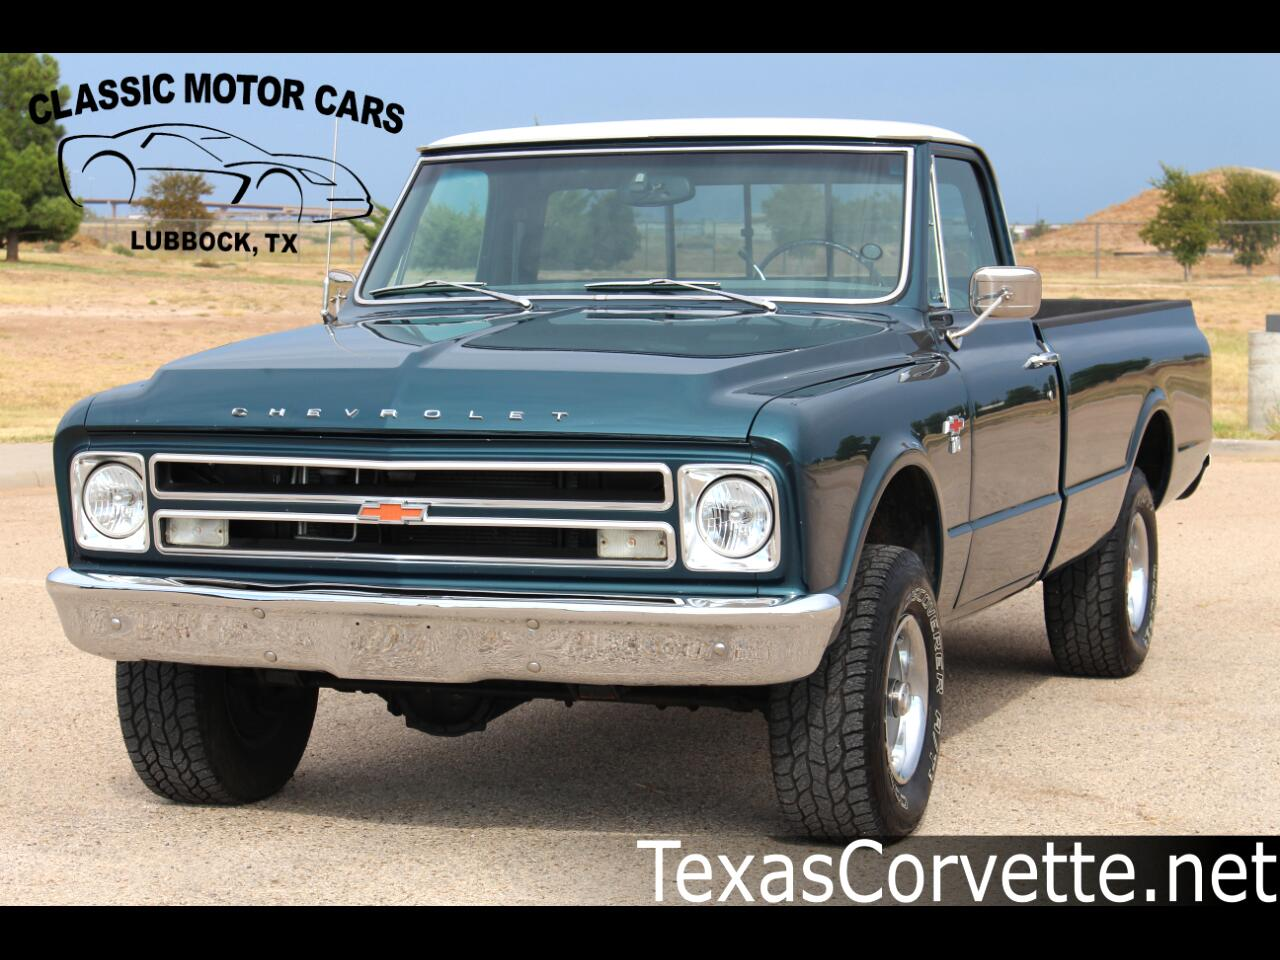 1967 Chevrolet K10 Long Bed 4x4